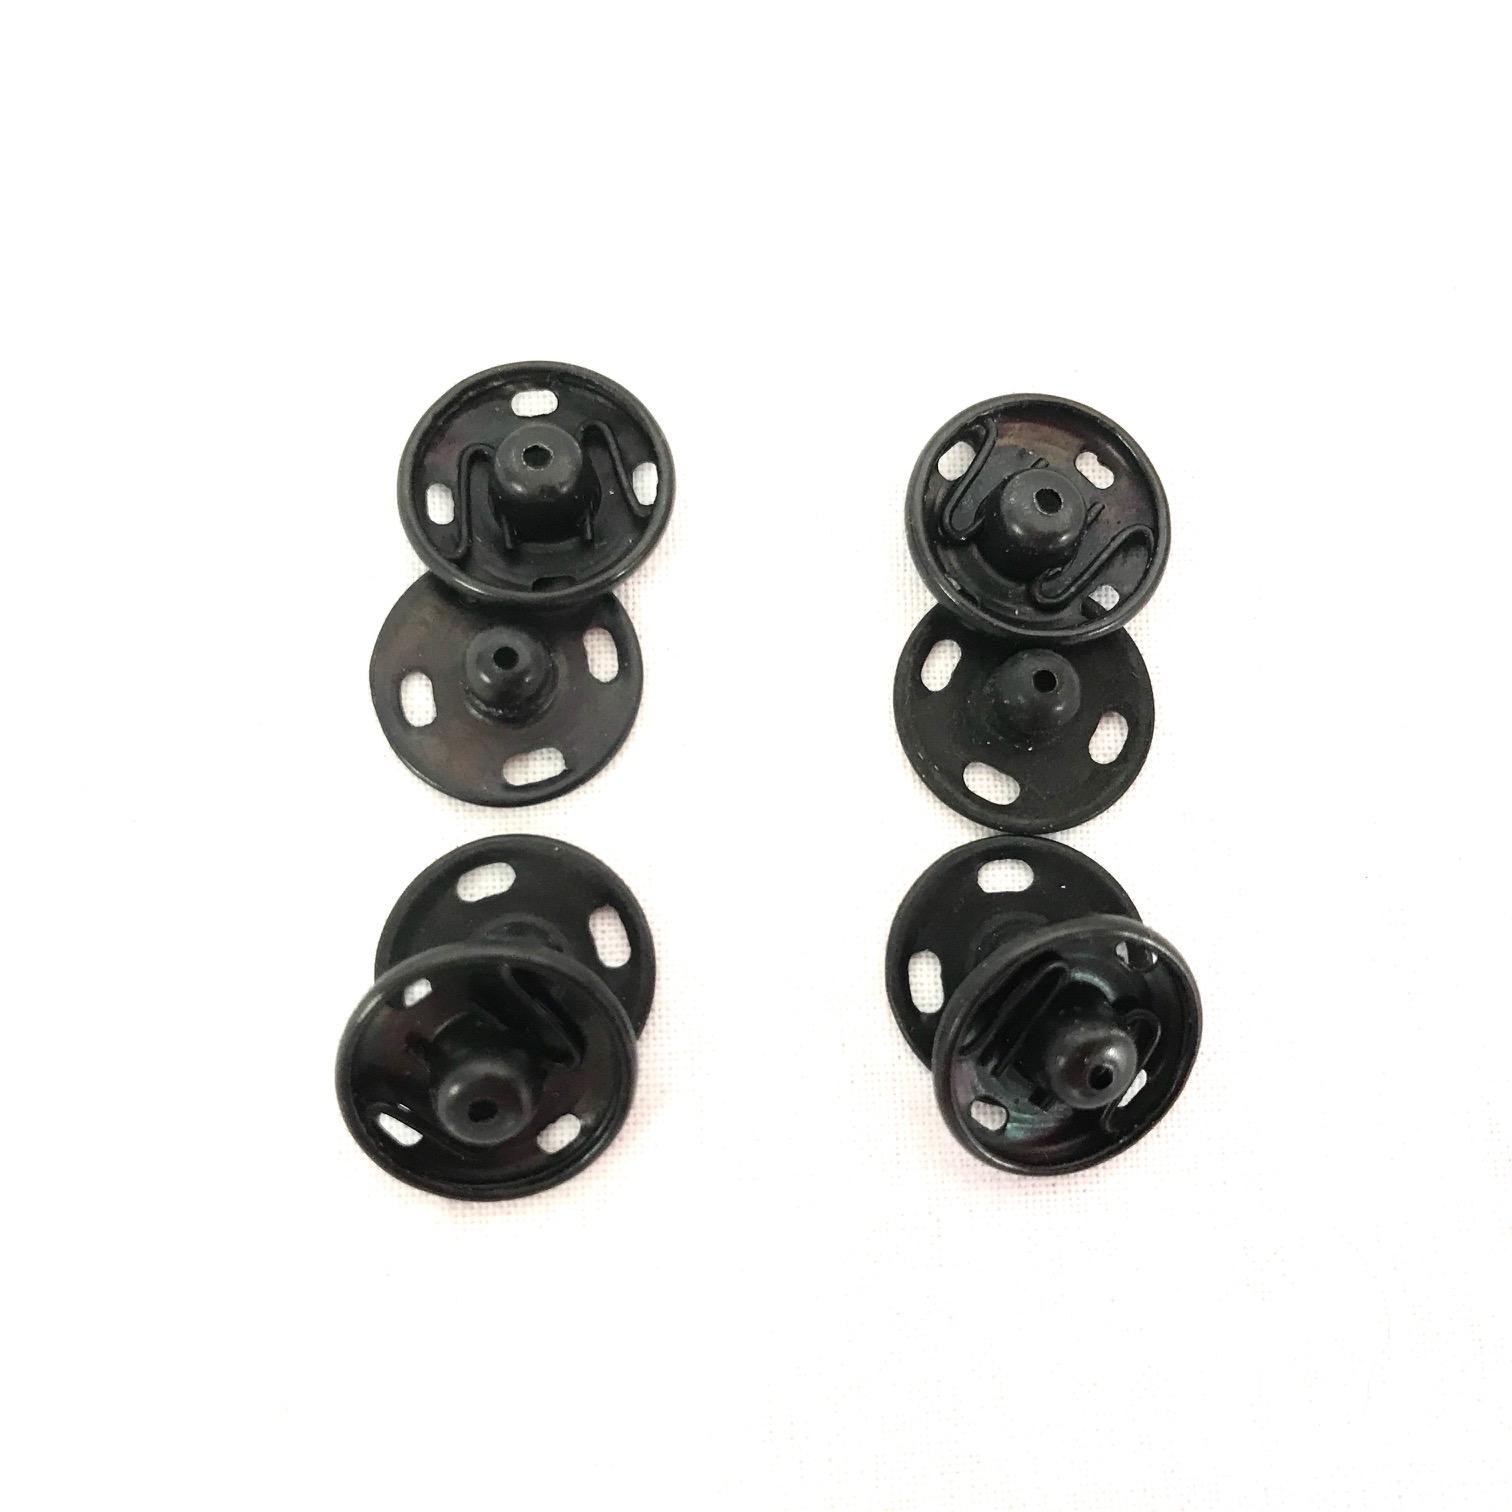 Boutons pression noir 15mm couture mercerie